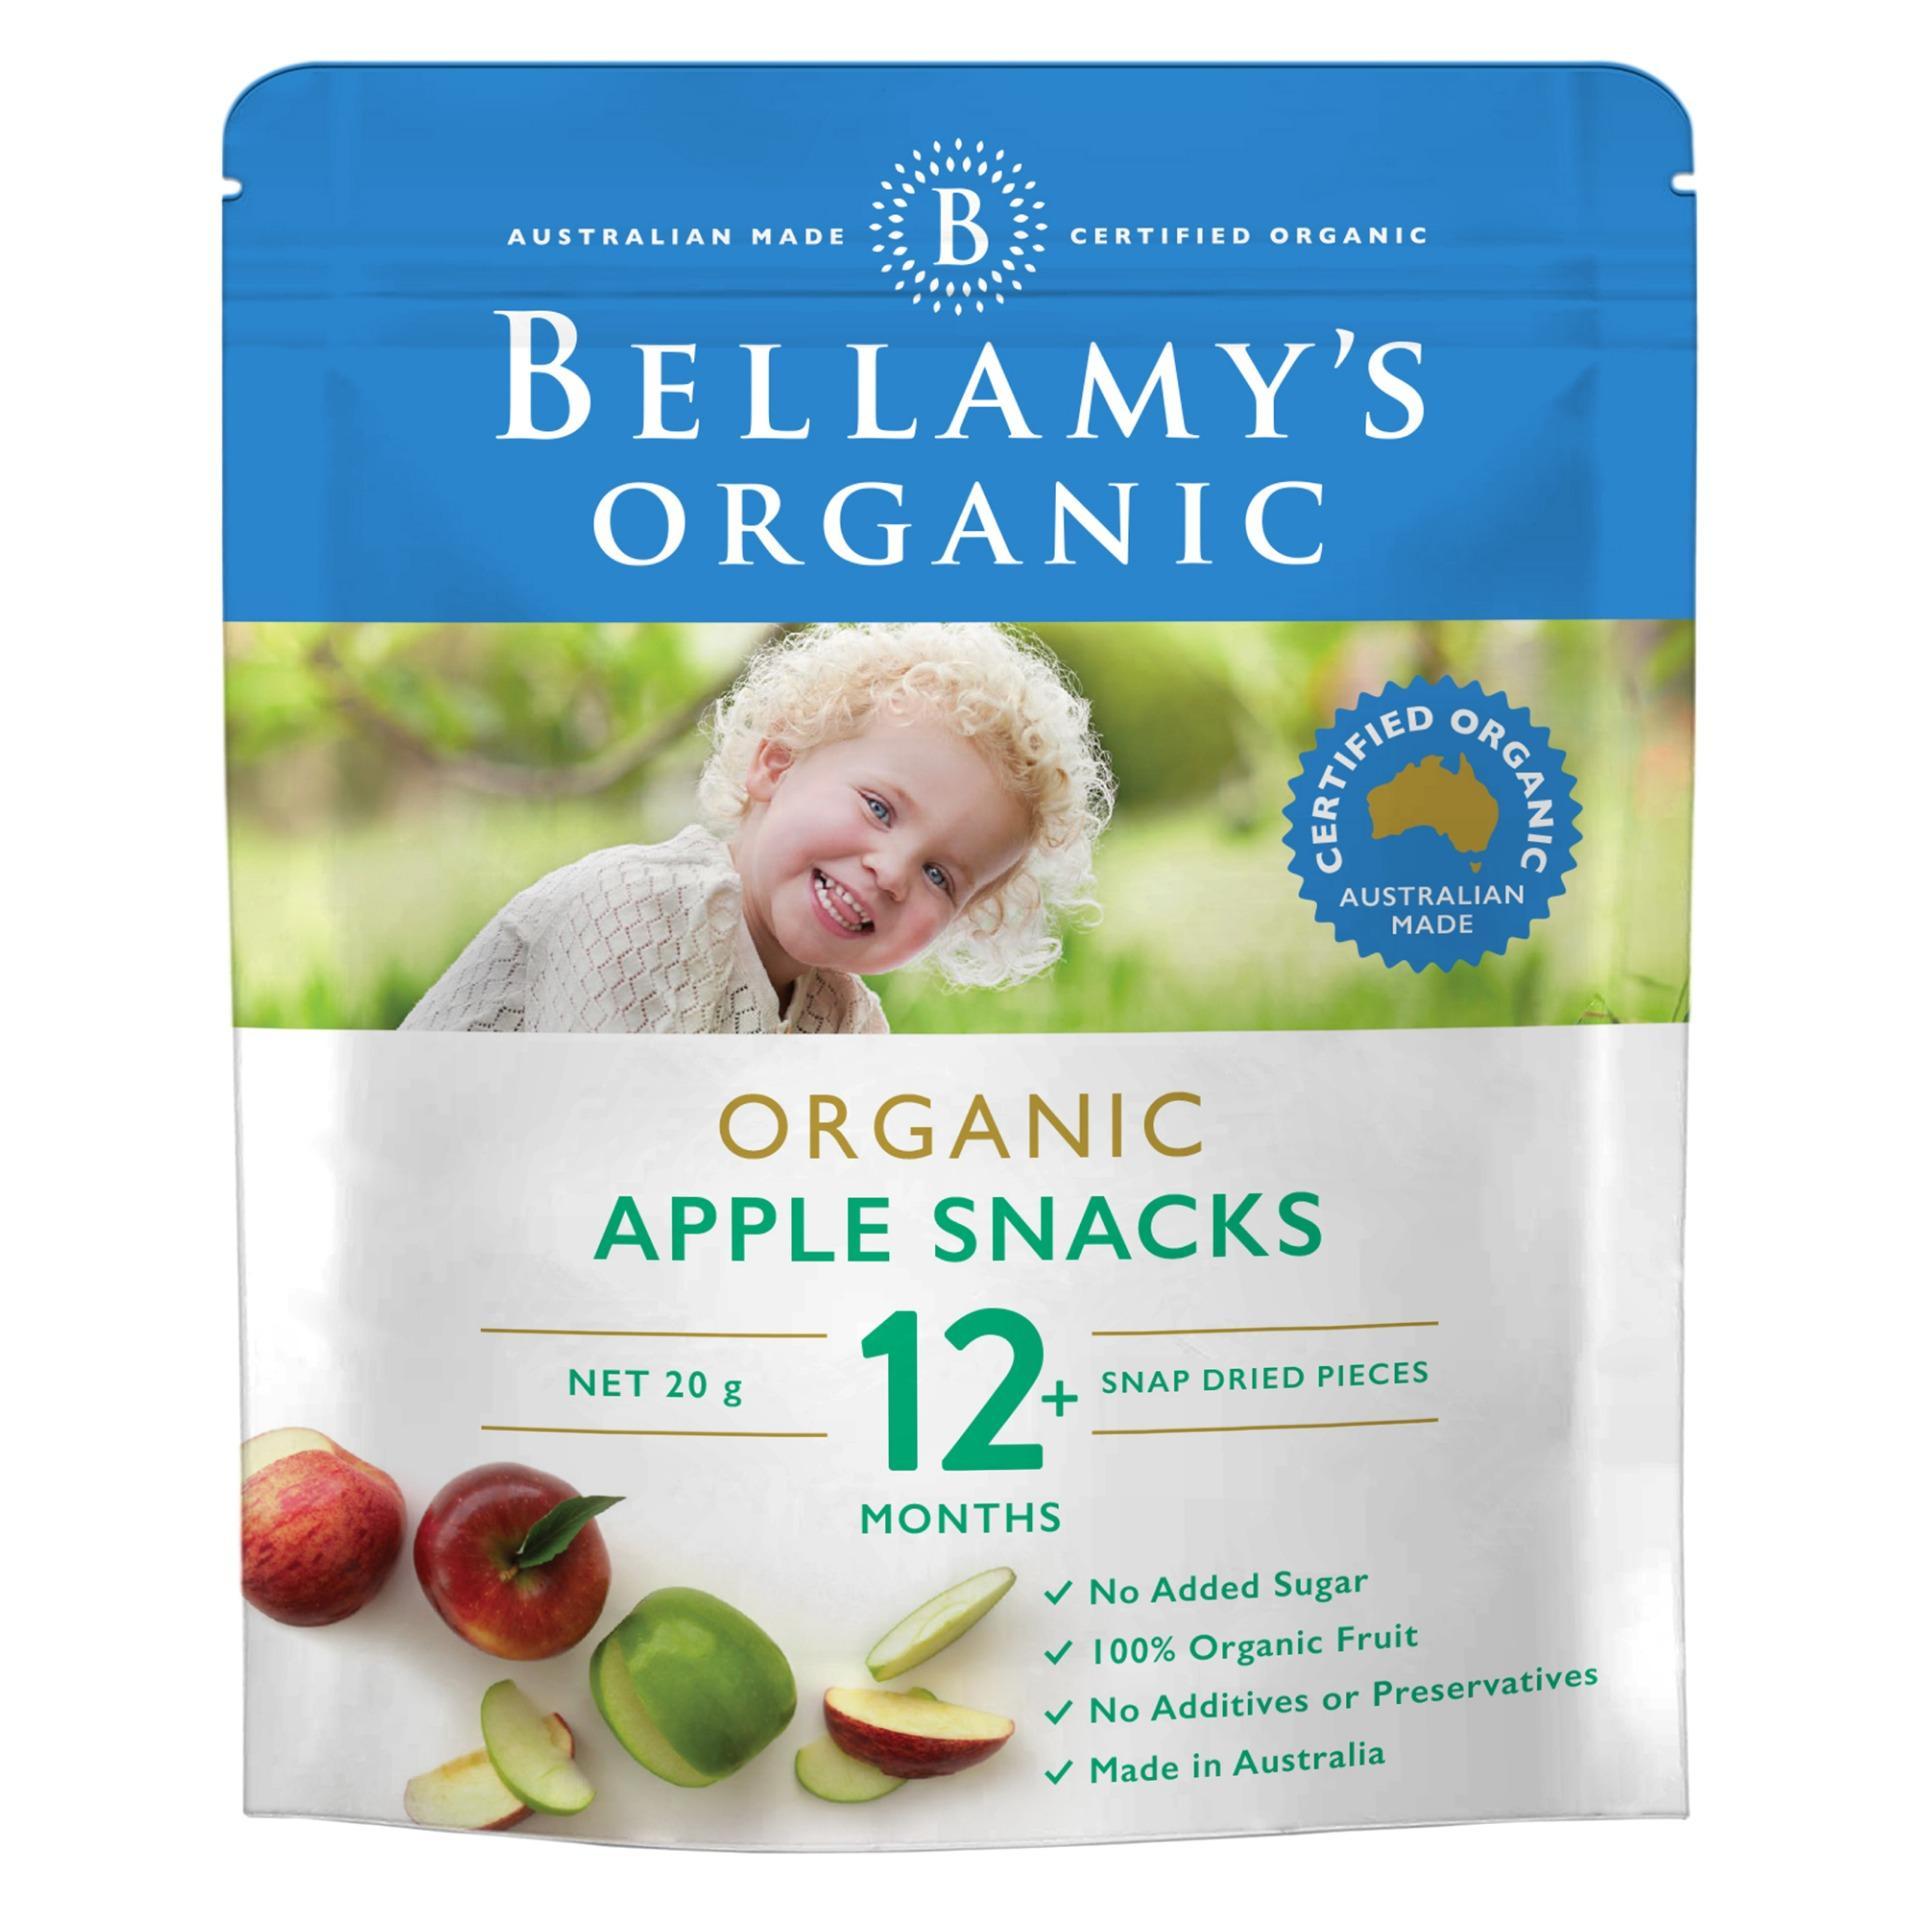 Bellamys Organic Organic Apple Snacks By Lazada Retail Bellamys Organic.